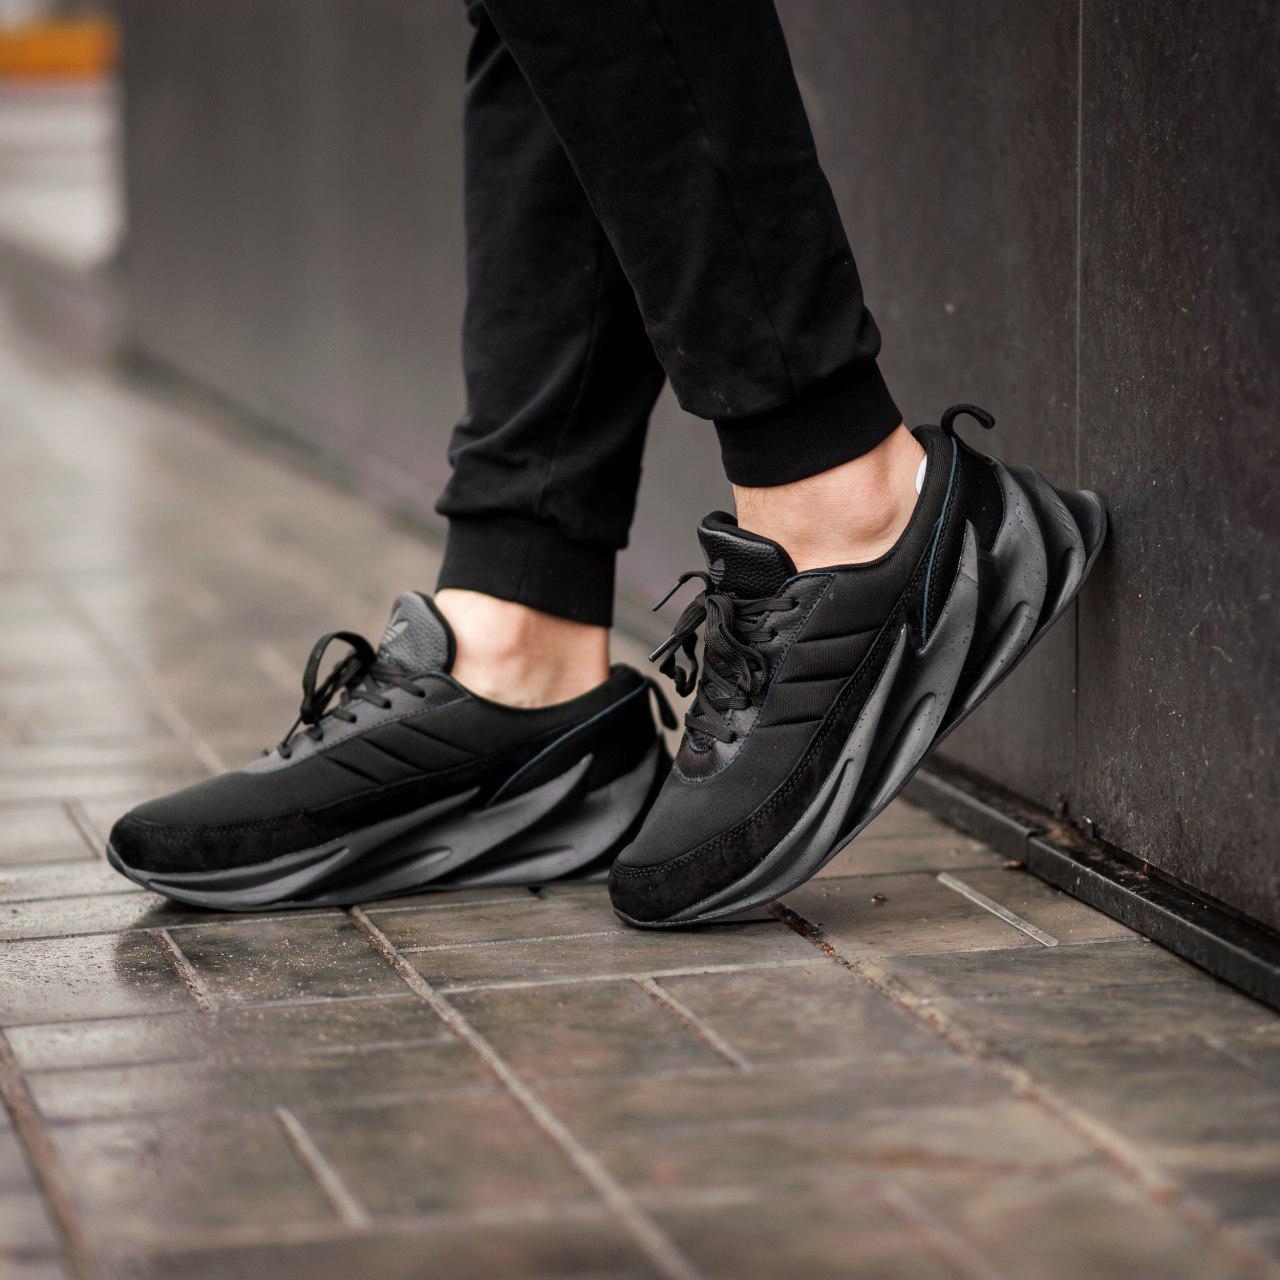 Мужские кроссовки Adidas Sharks Black (Реплика ААА+)